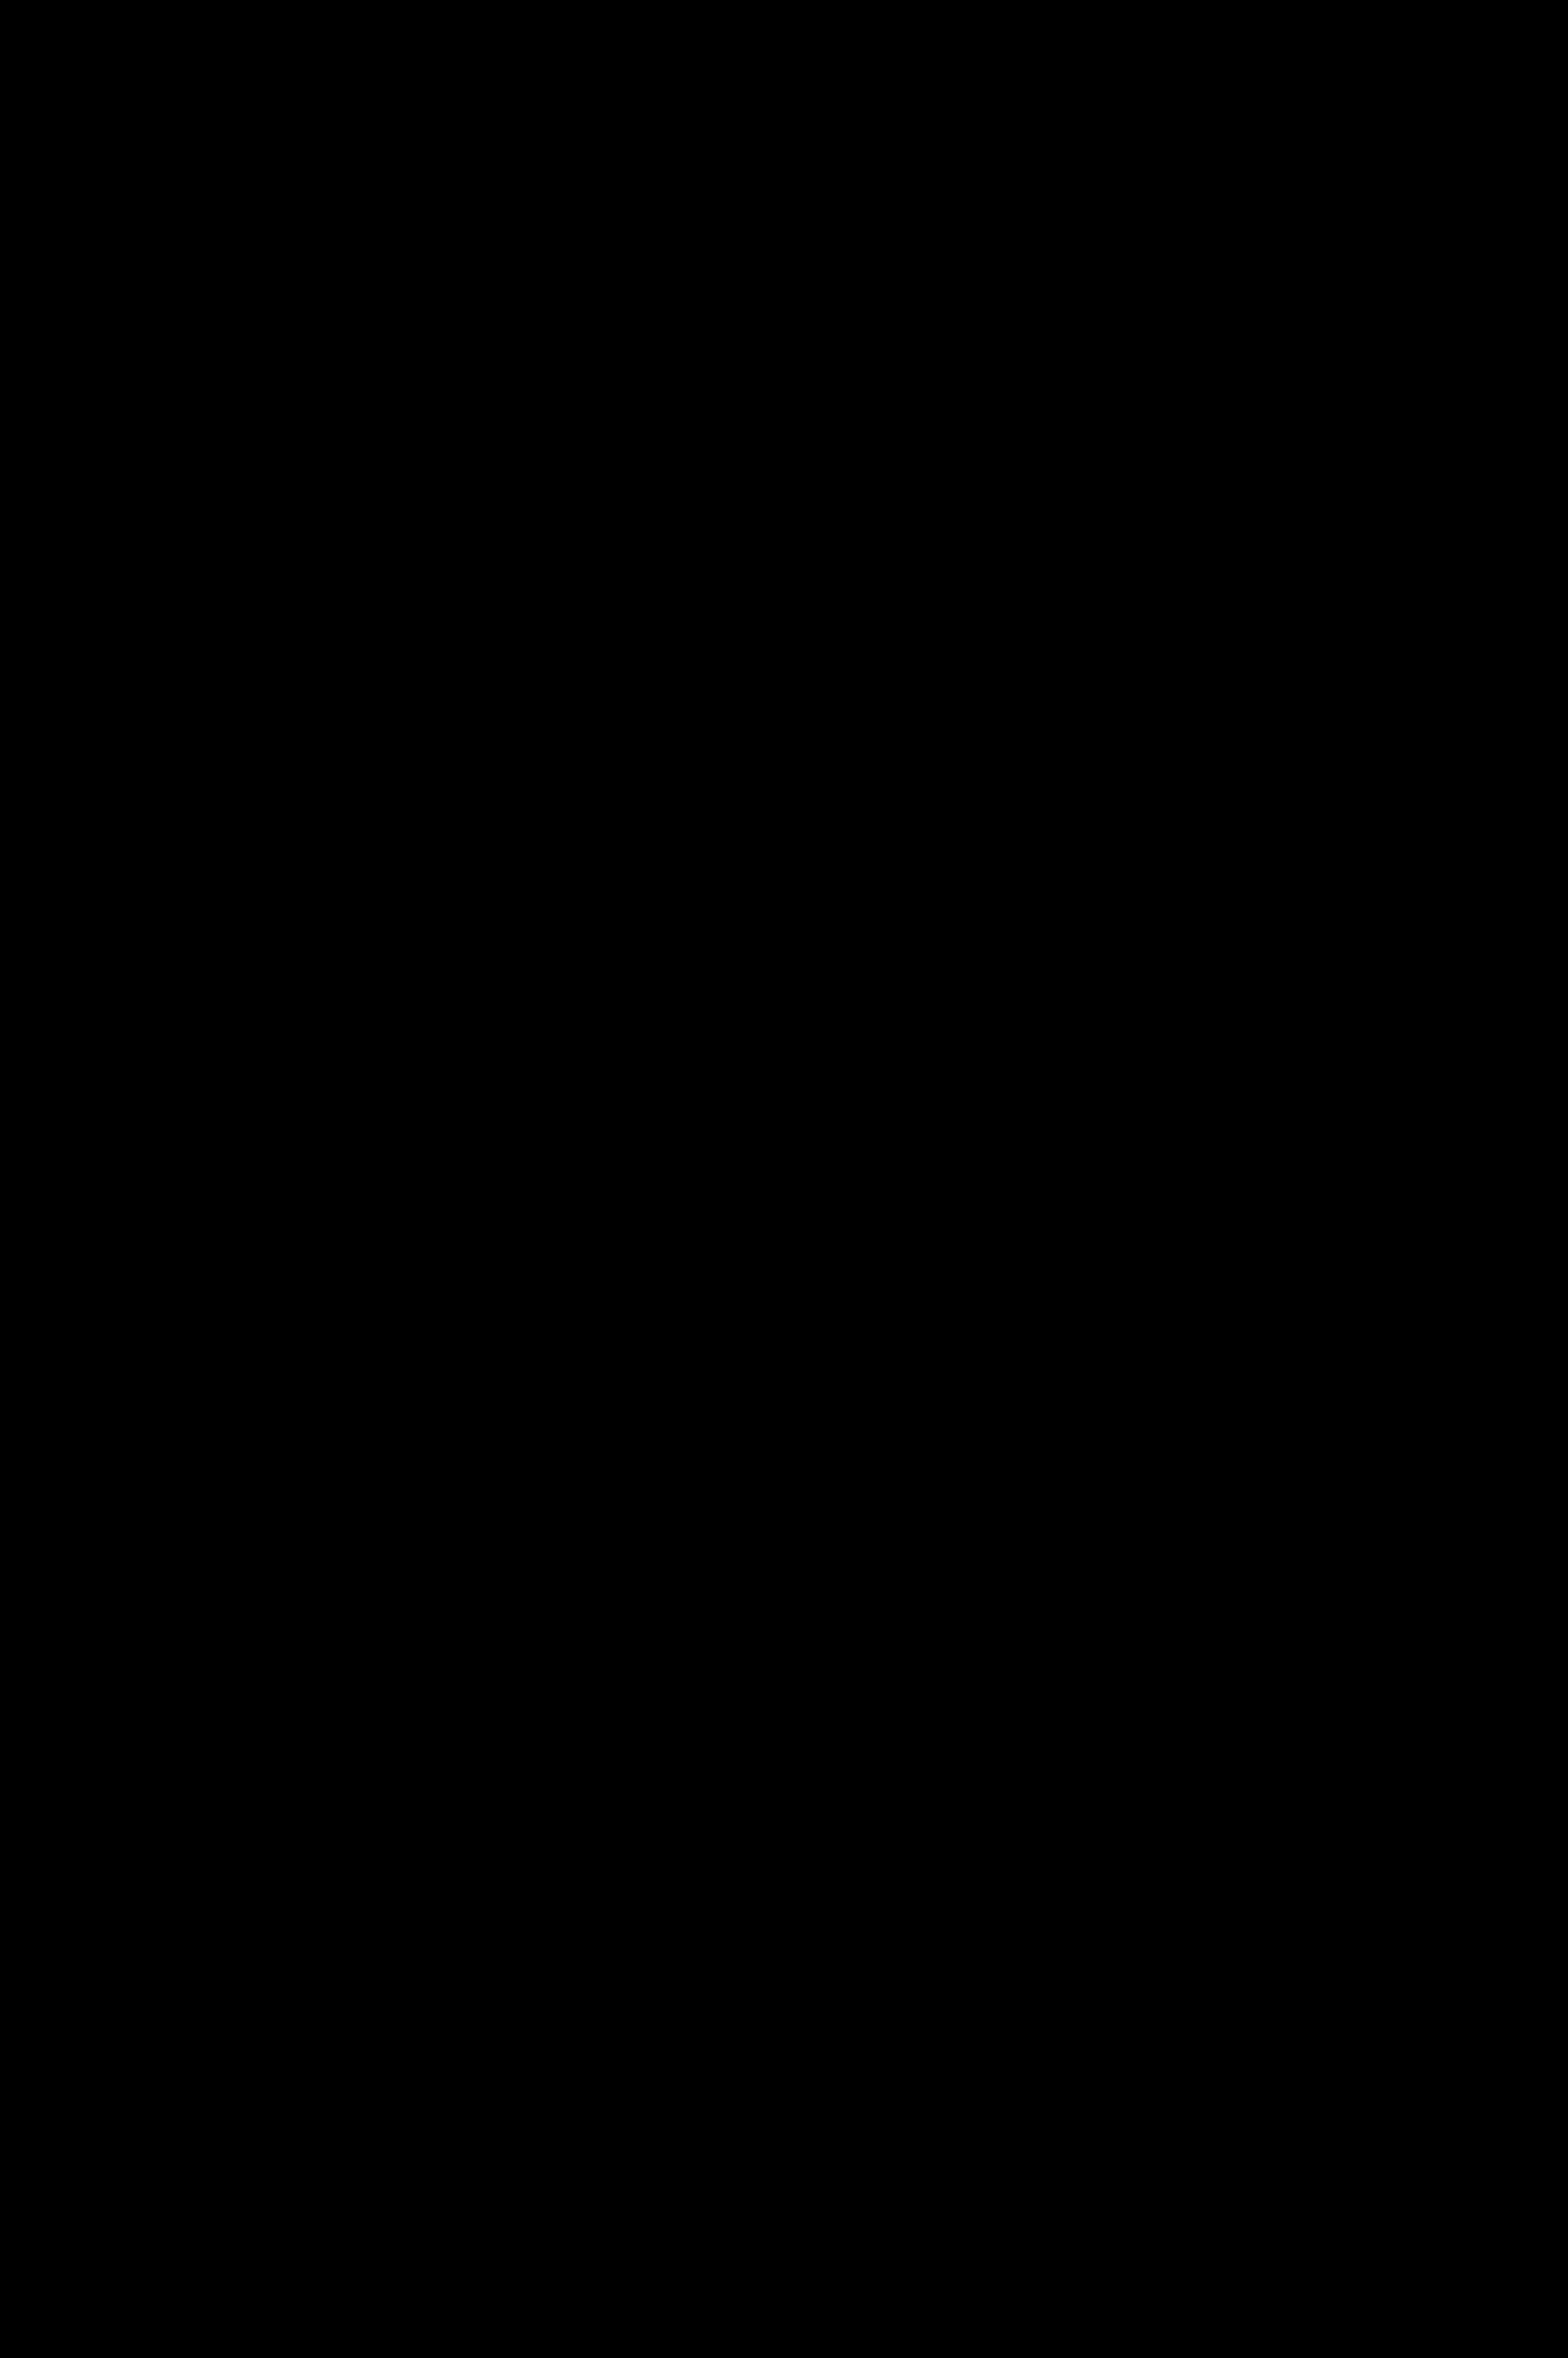 Download Illuminati Hands Png Vector Transparent Download Ŝ–標 Ɖ‹æŒ‡ Icon Full Size Png Image Pngkit Christmas coronavirus photos new backgrounds popular beauty photos popular transparent png collages. download illuminati hands png vector